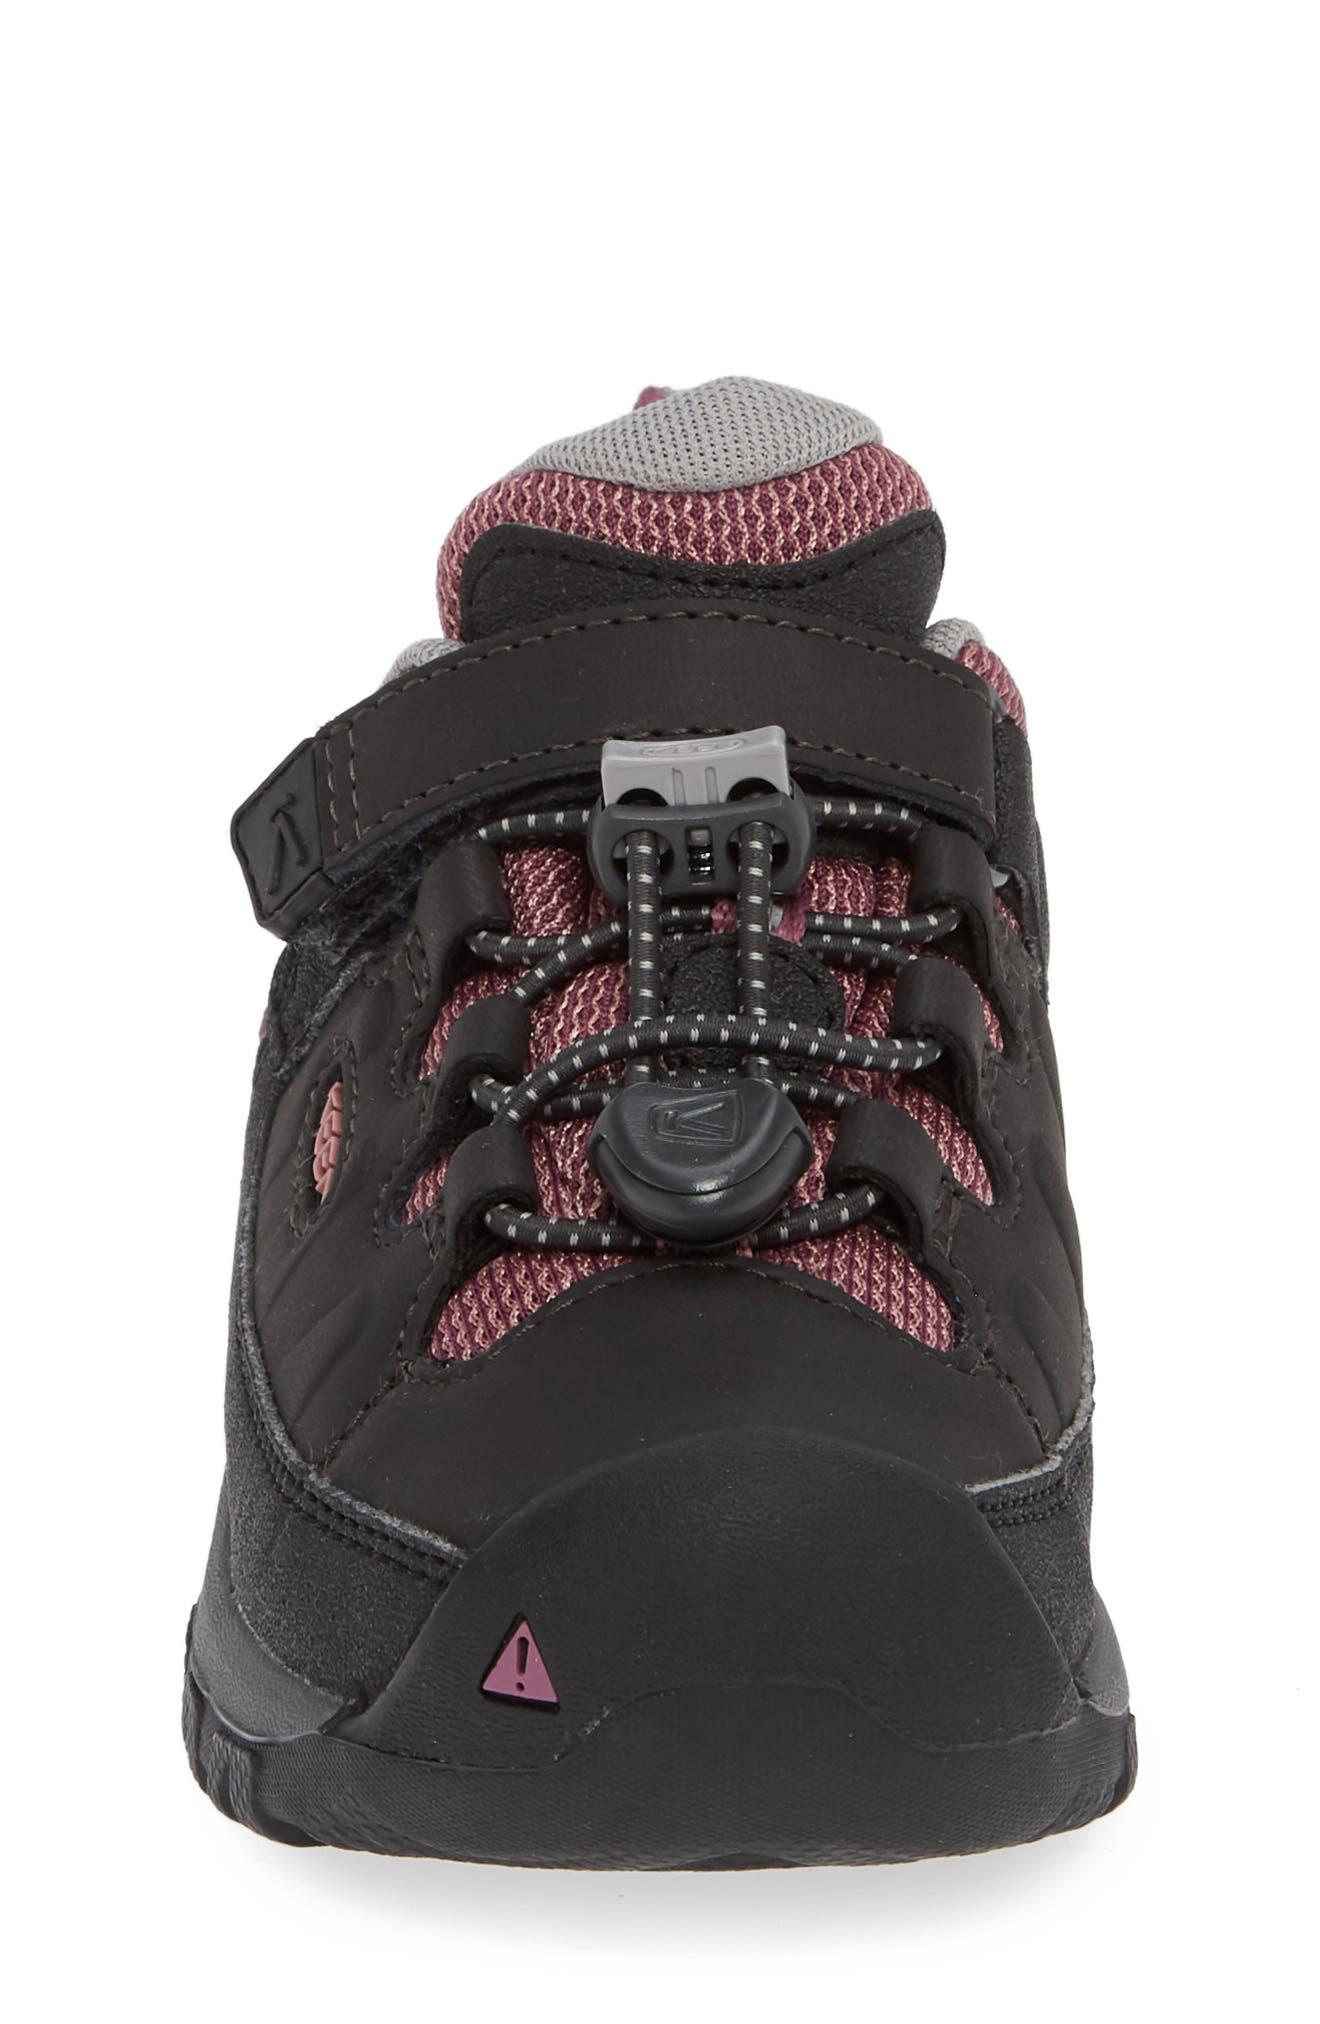 KEEN, Targhee Low Waterproof Sneaker, Alternate thumbnail 4, color, RAVEN/ TULIPWOOD